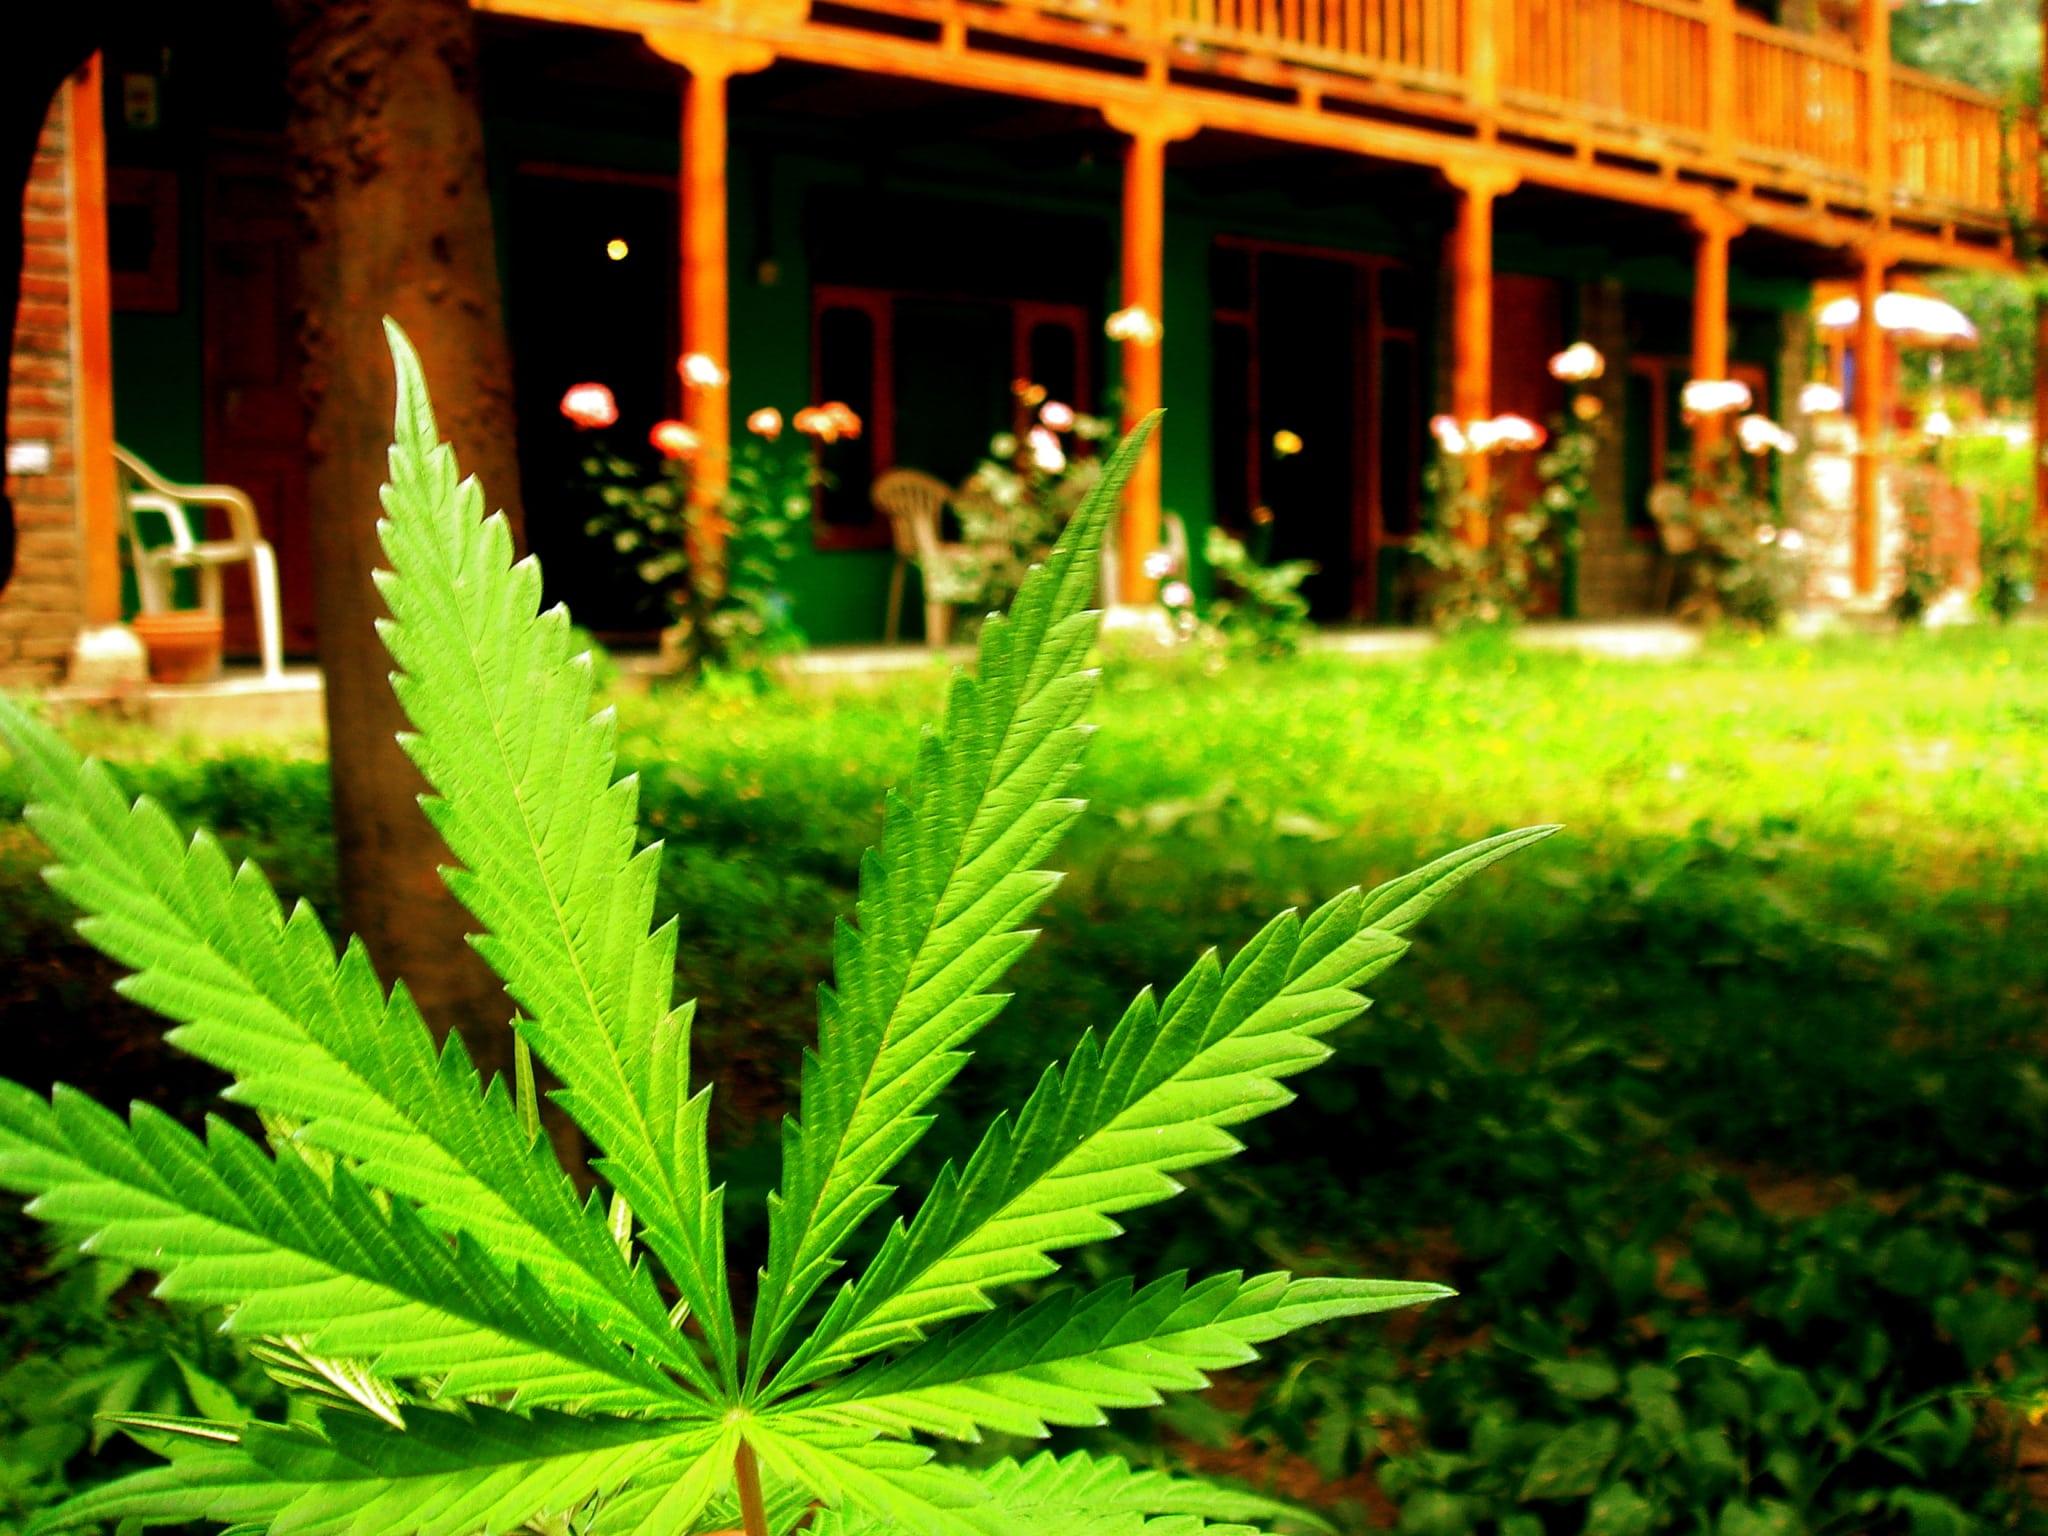 Marijuana_leaf_at_Veer_Guest_House,_Manali_(164703748)